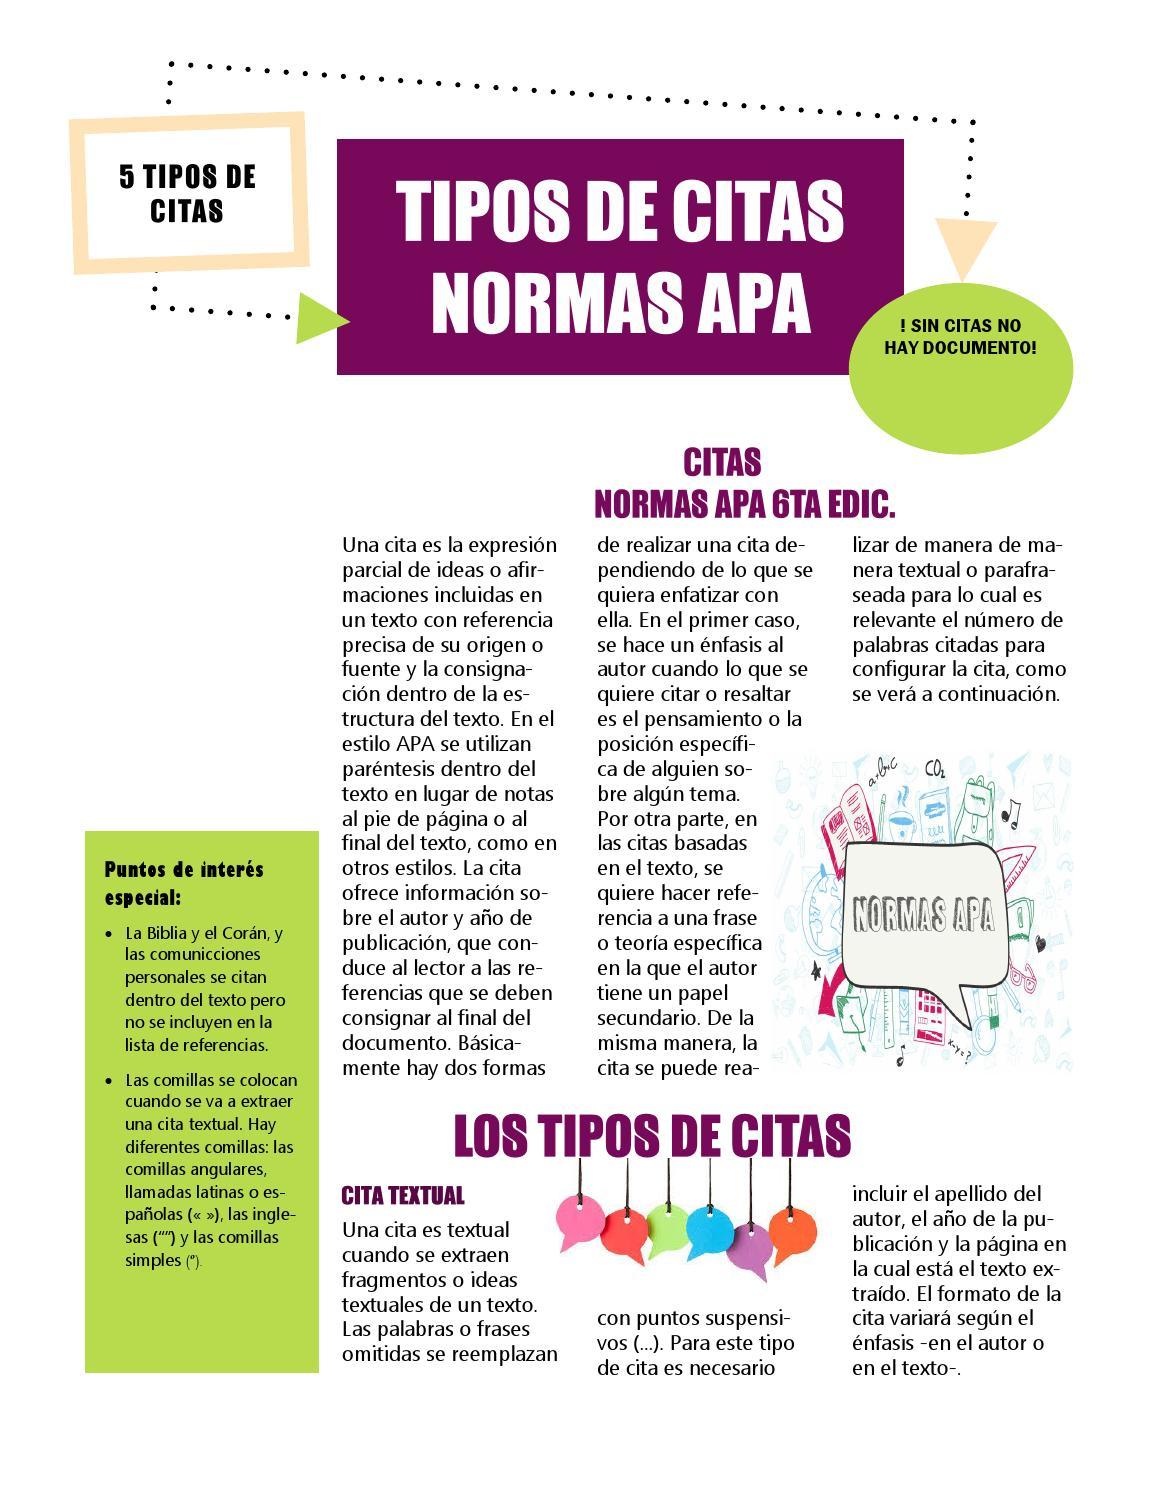 Tipos De Citas Normas Apa Subir By Aguilar Mafe Issuu